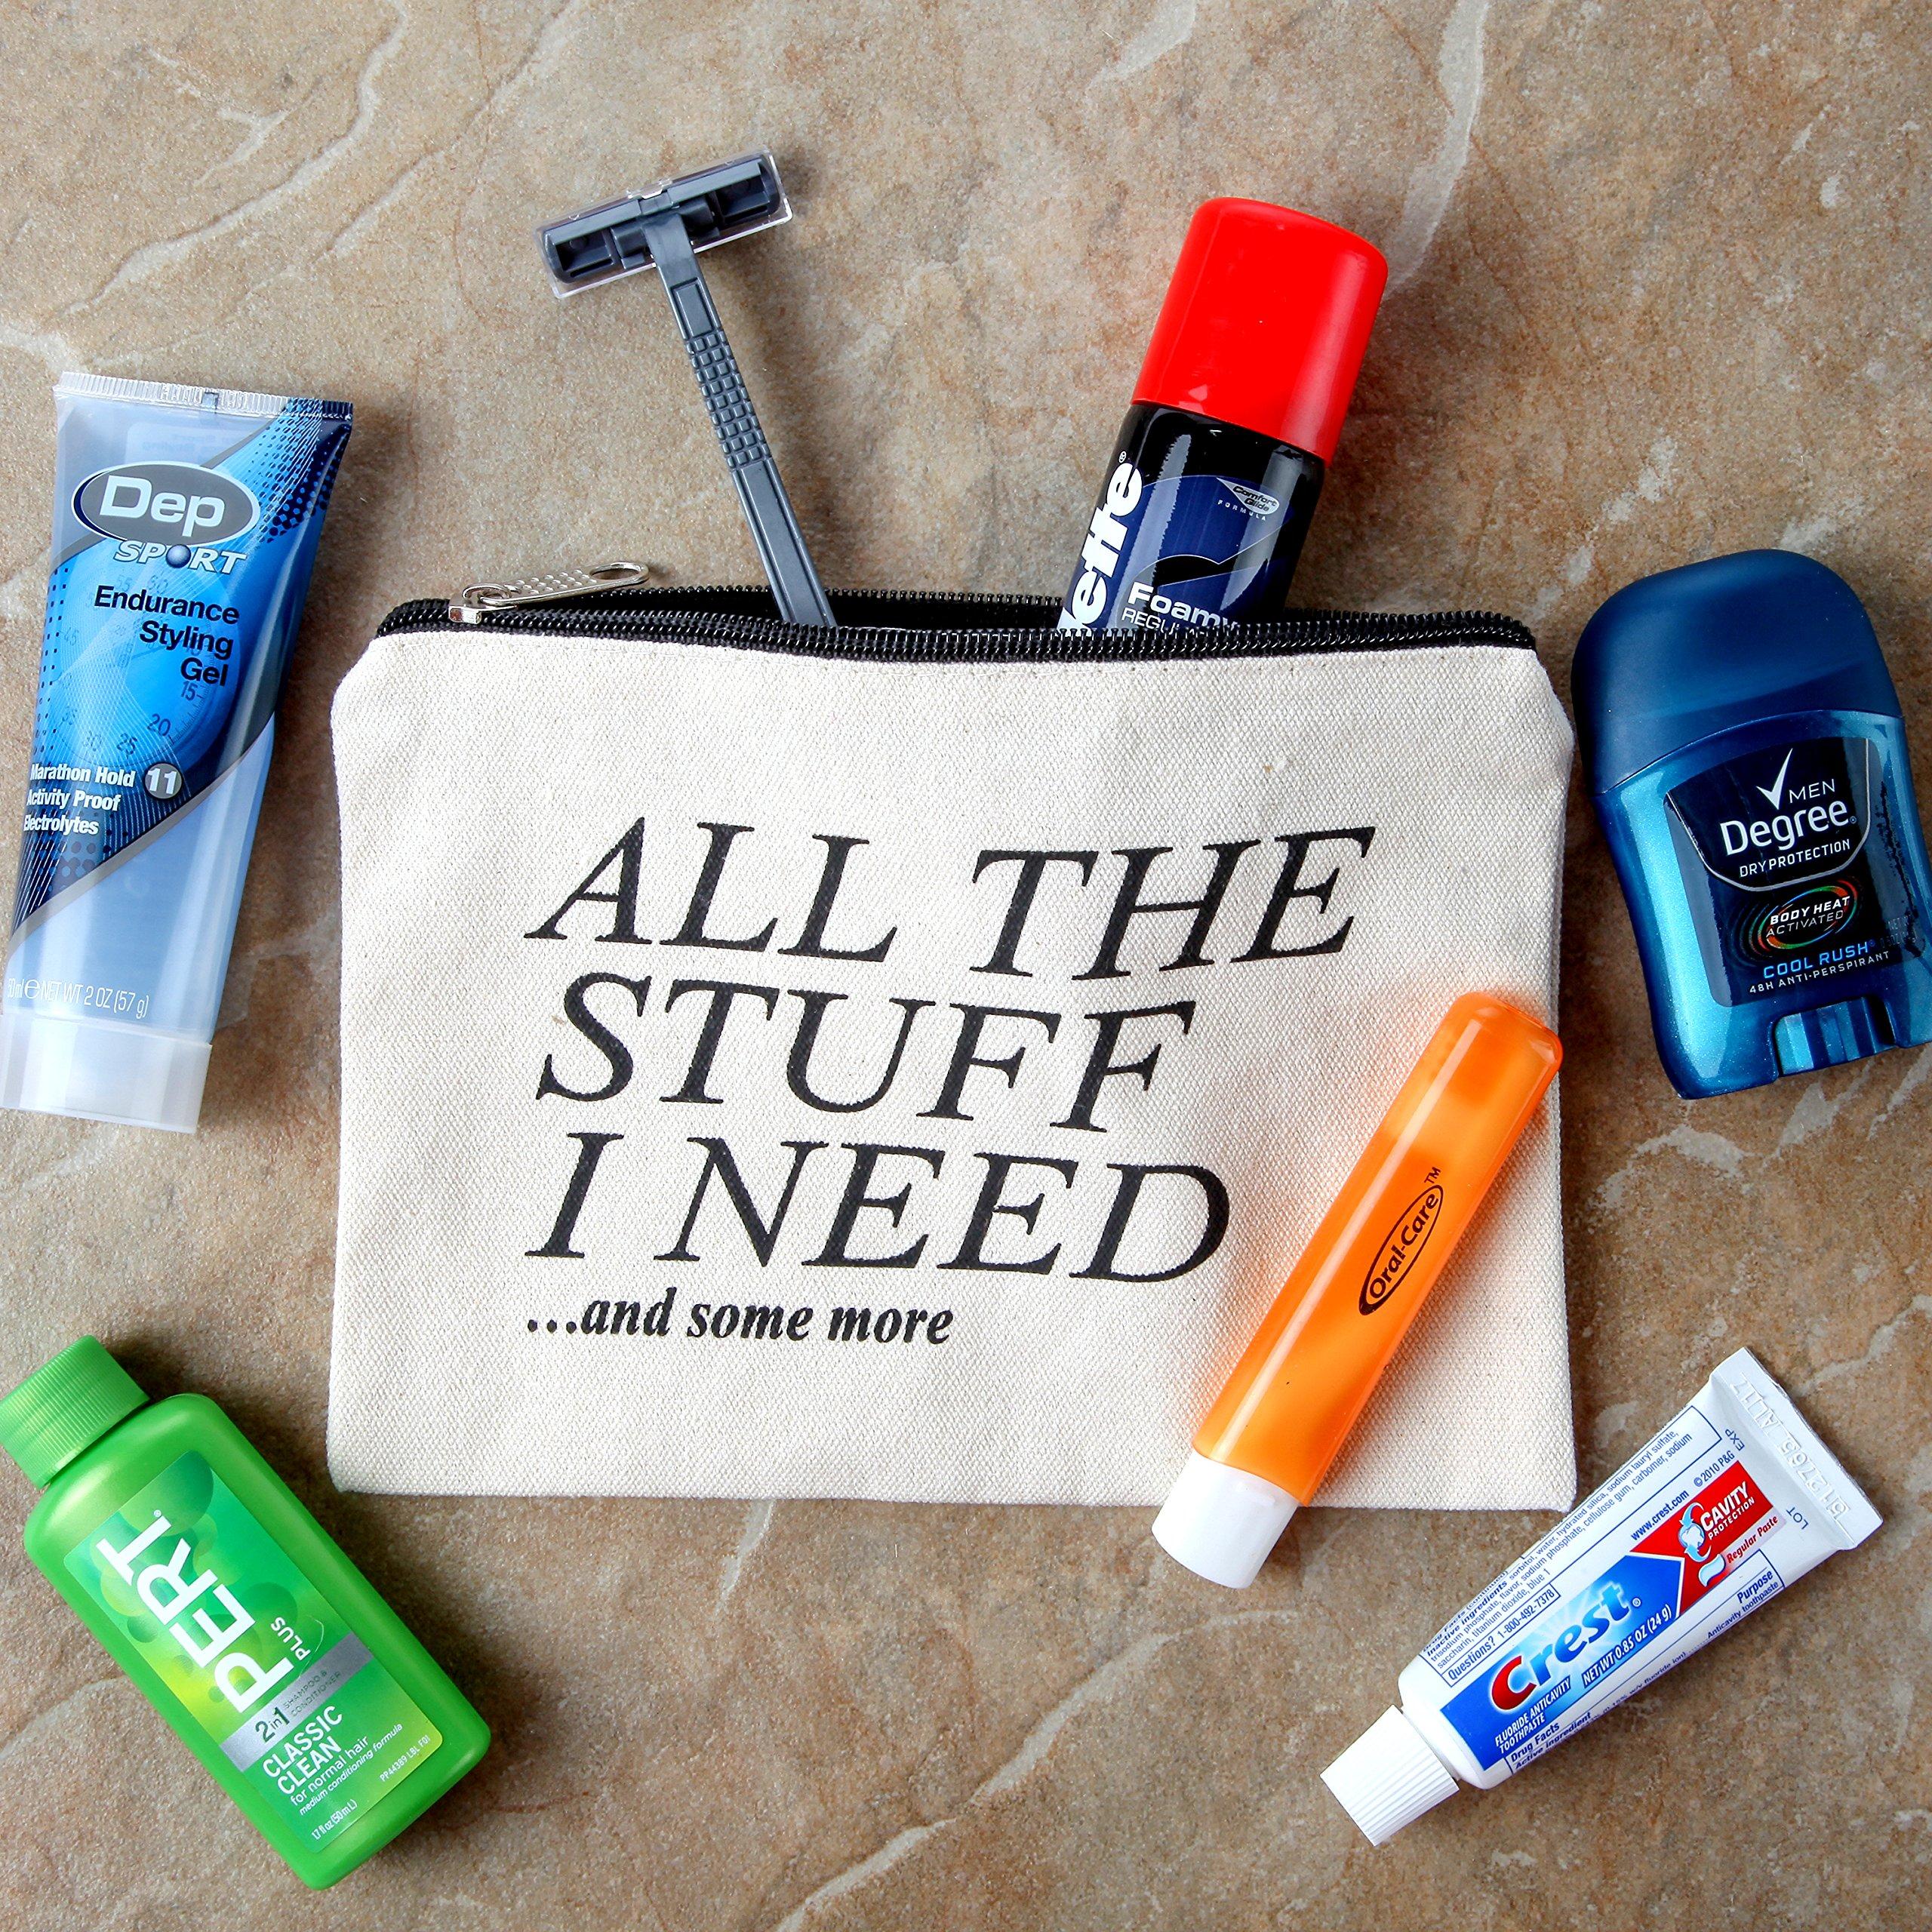 Canvas Zipper Pouch, Cotton Cosmetic Makeup Bag, Student School Art Supplies Organizer, Cute Quote Zip Cotton Pouches for Women, Holds 50 Pencil-Make Up-Toiletries-Phones-Electronics